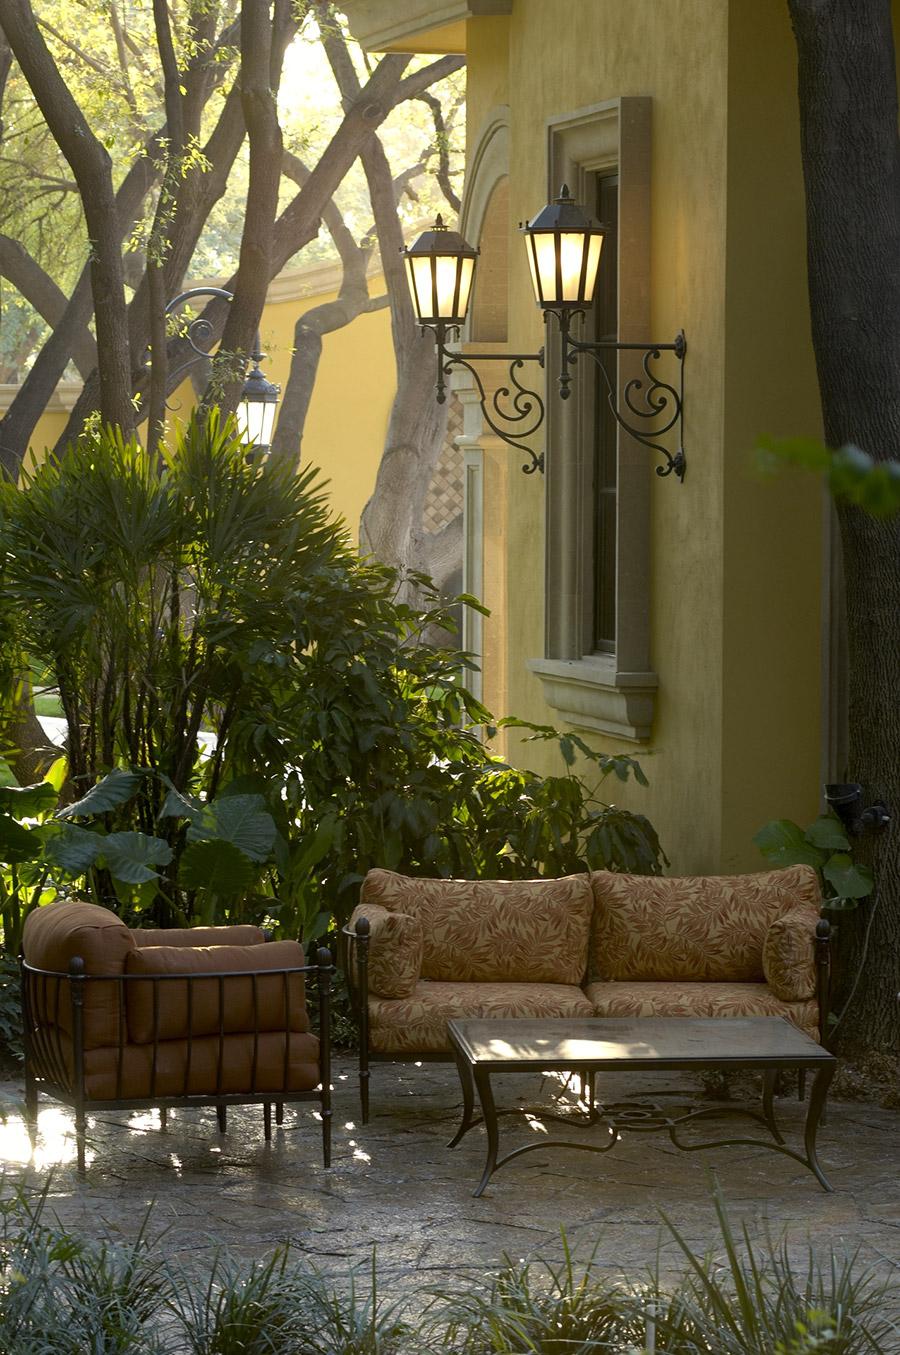 Sicilia-OLS-CLA-E-004-classic-outdoor-Steel-Lighting-Santa-Barbara-Residence-(3)